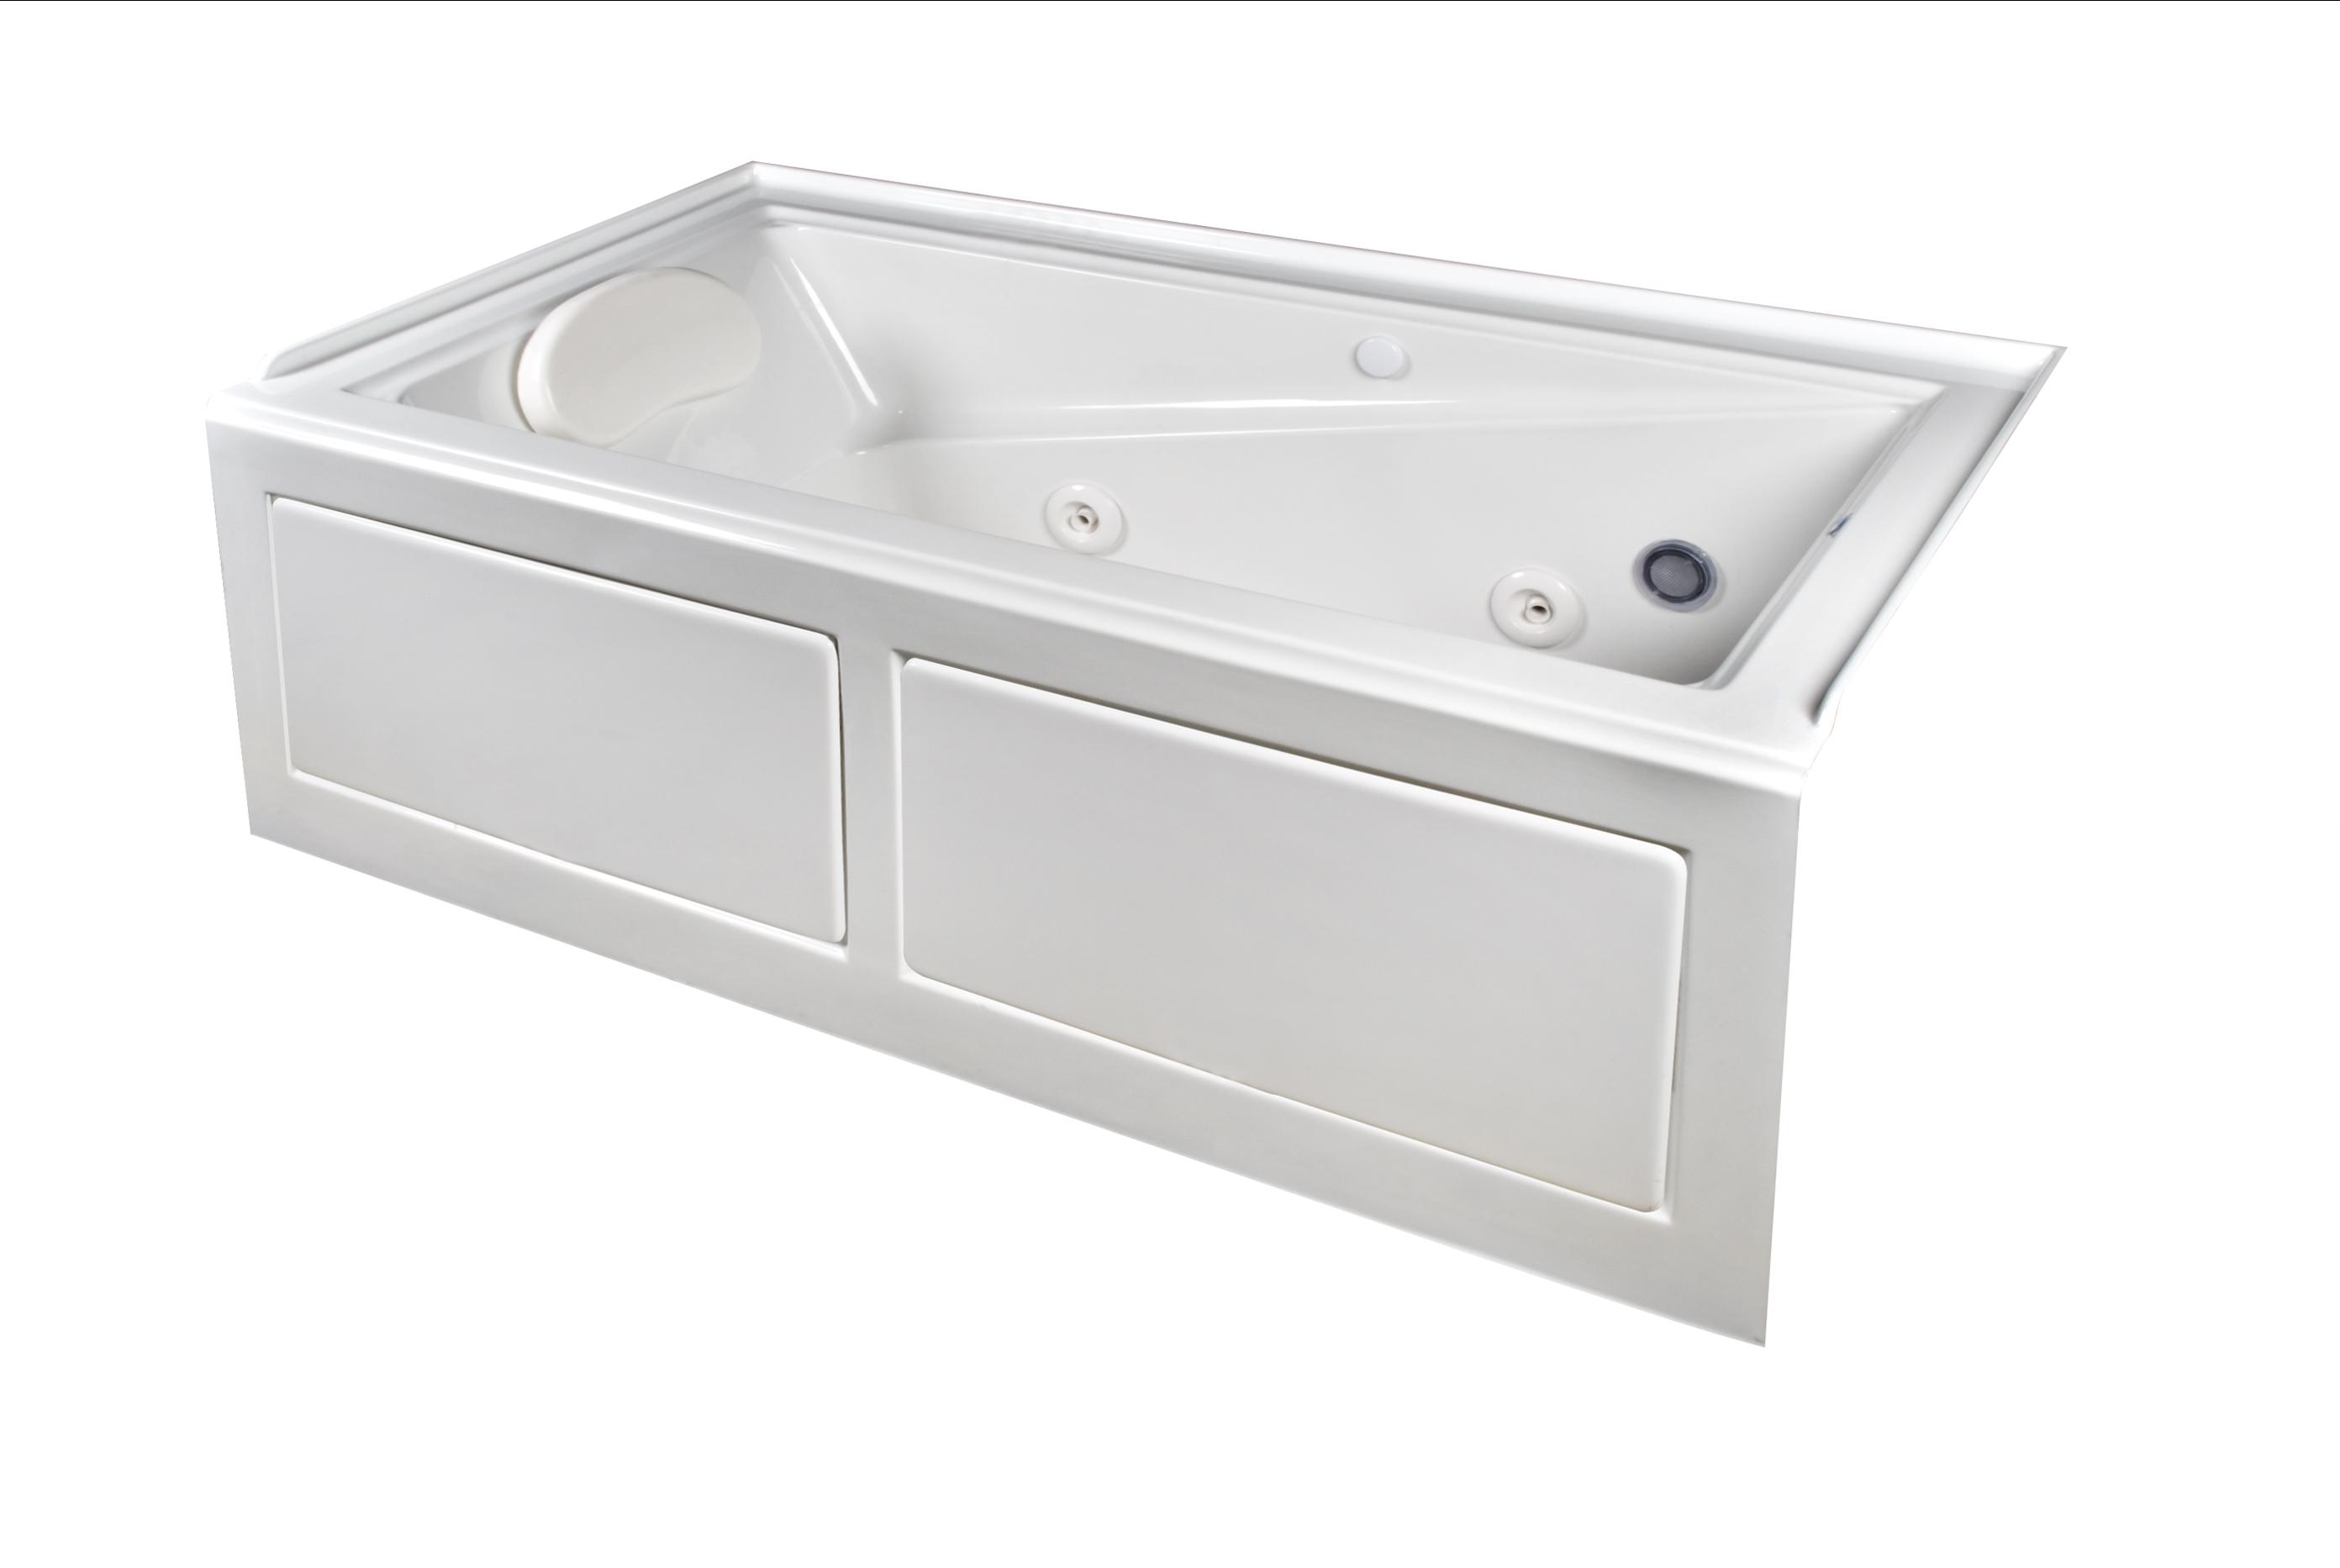 Mansfield Barrett Soaking Tub Whirlpool Tub